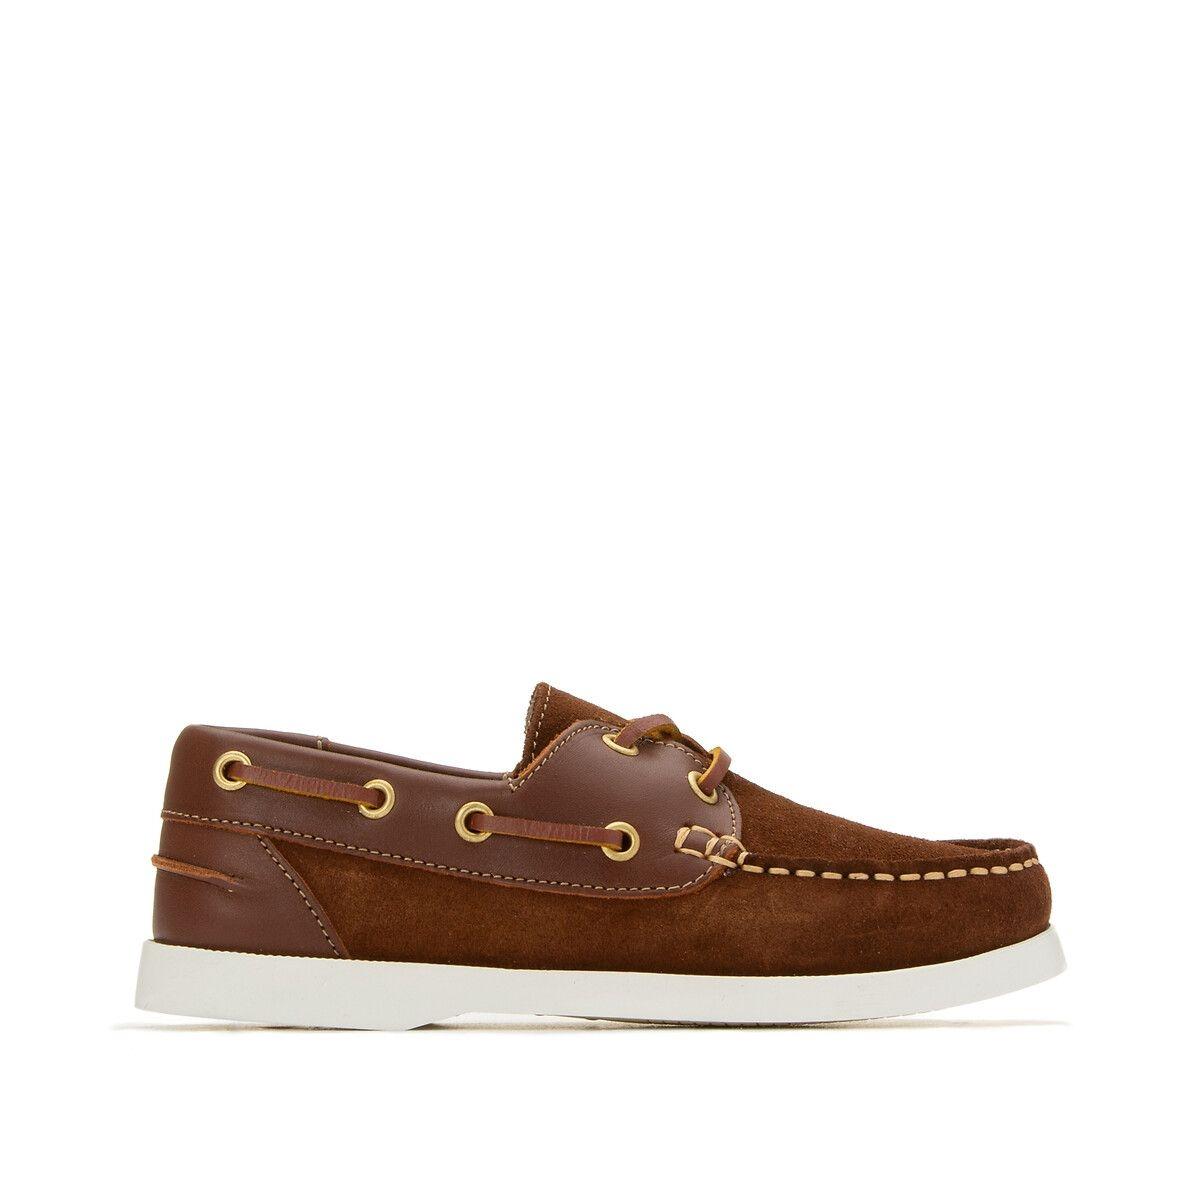 Chaussures bateau en cuir 26-39